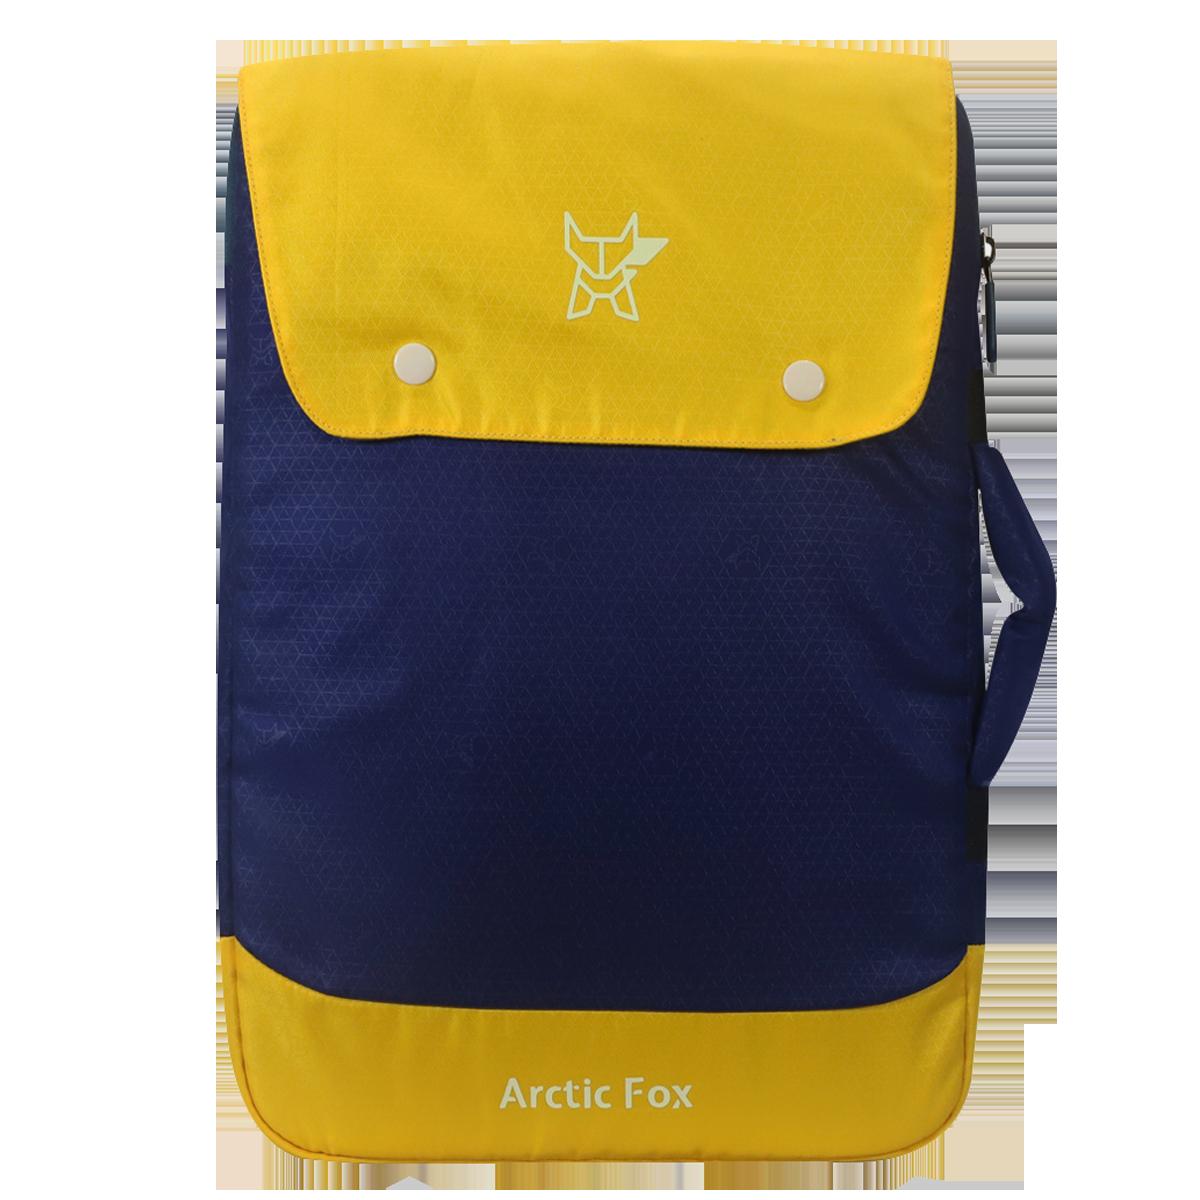 Arctic Fox Bonded Polyester Fabric Sleeve for Laptop (FACLSLNVYOE138000, Blue)_1